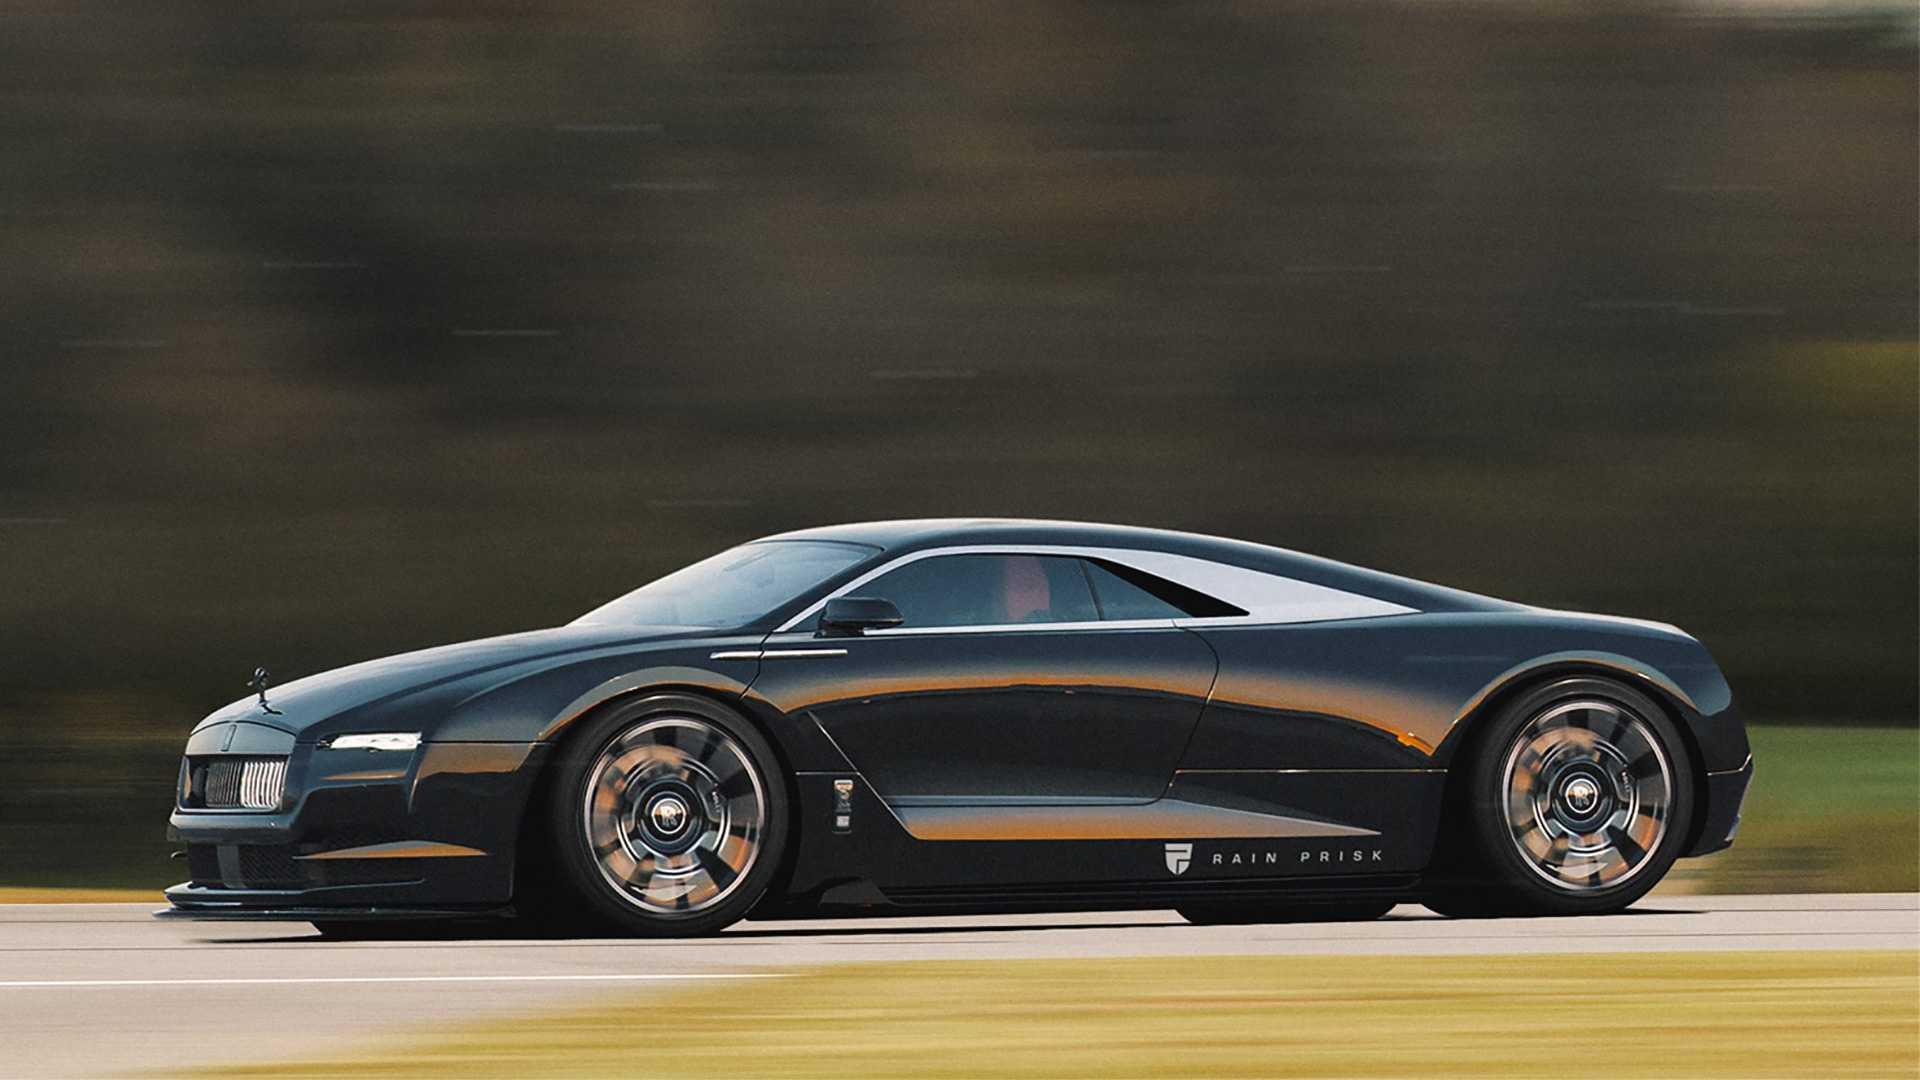 Rolls-Royce Rendering Imagines A Mid-Engine Luxury Supercar